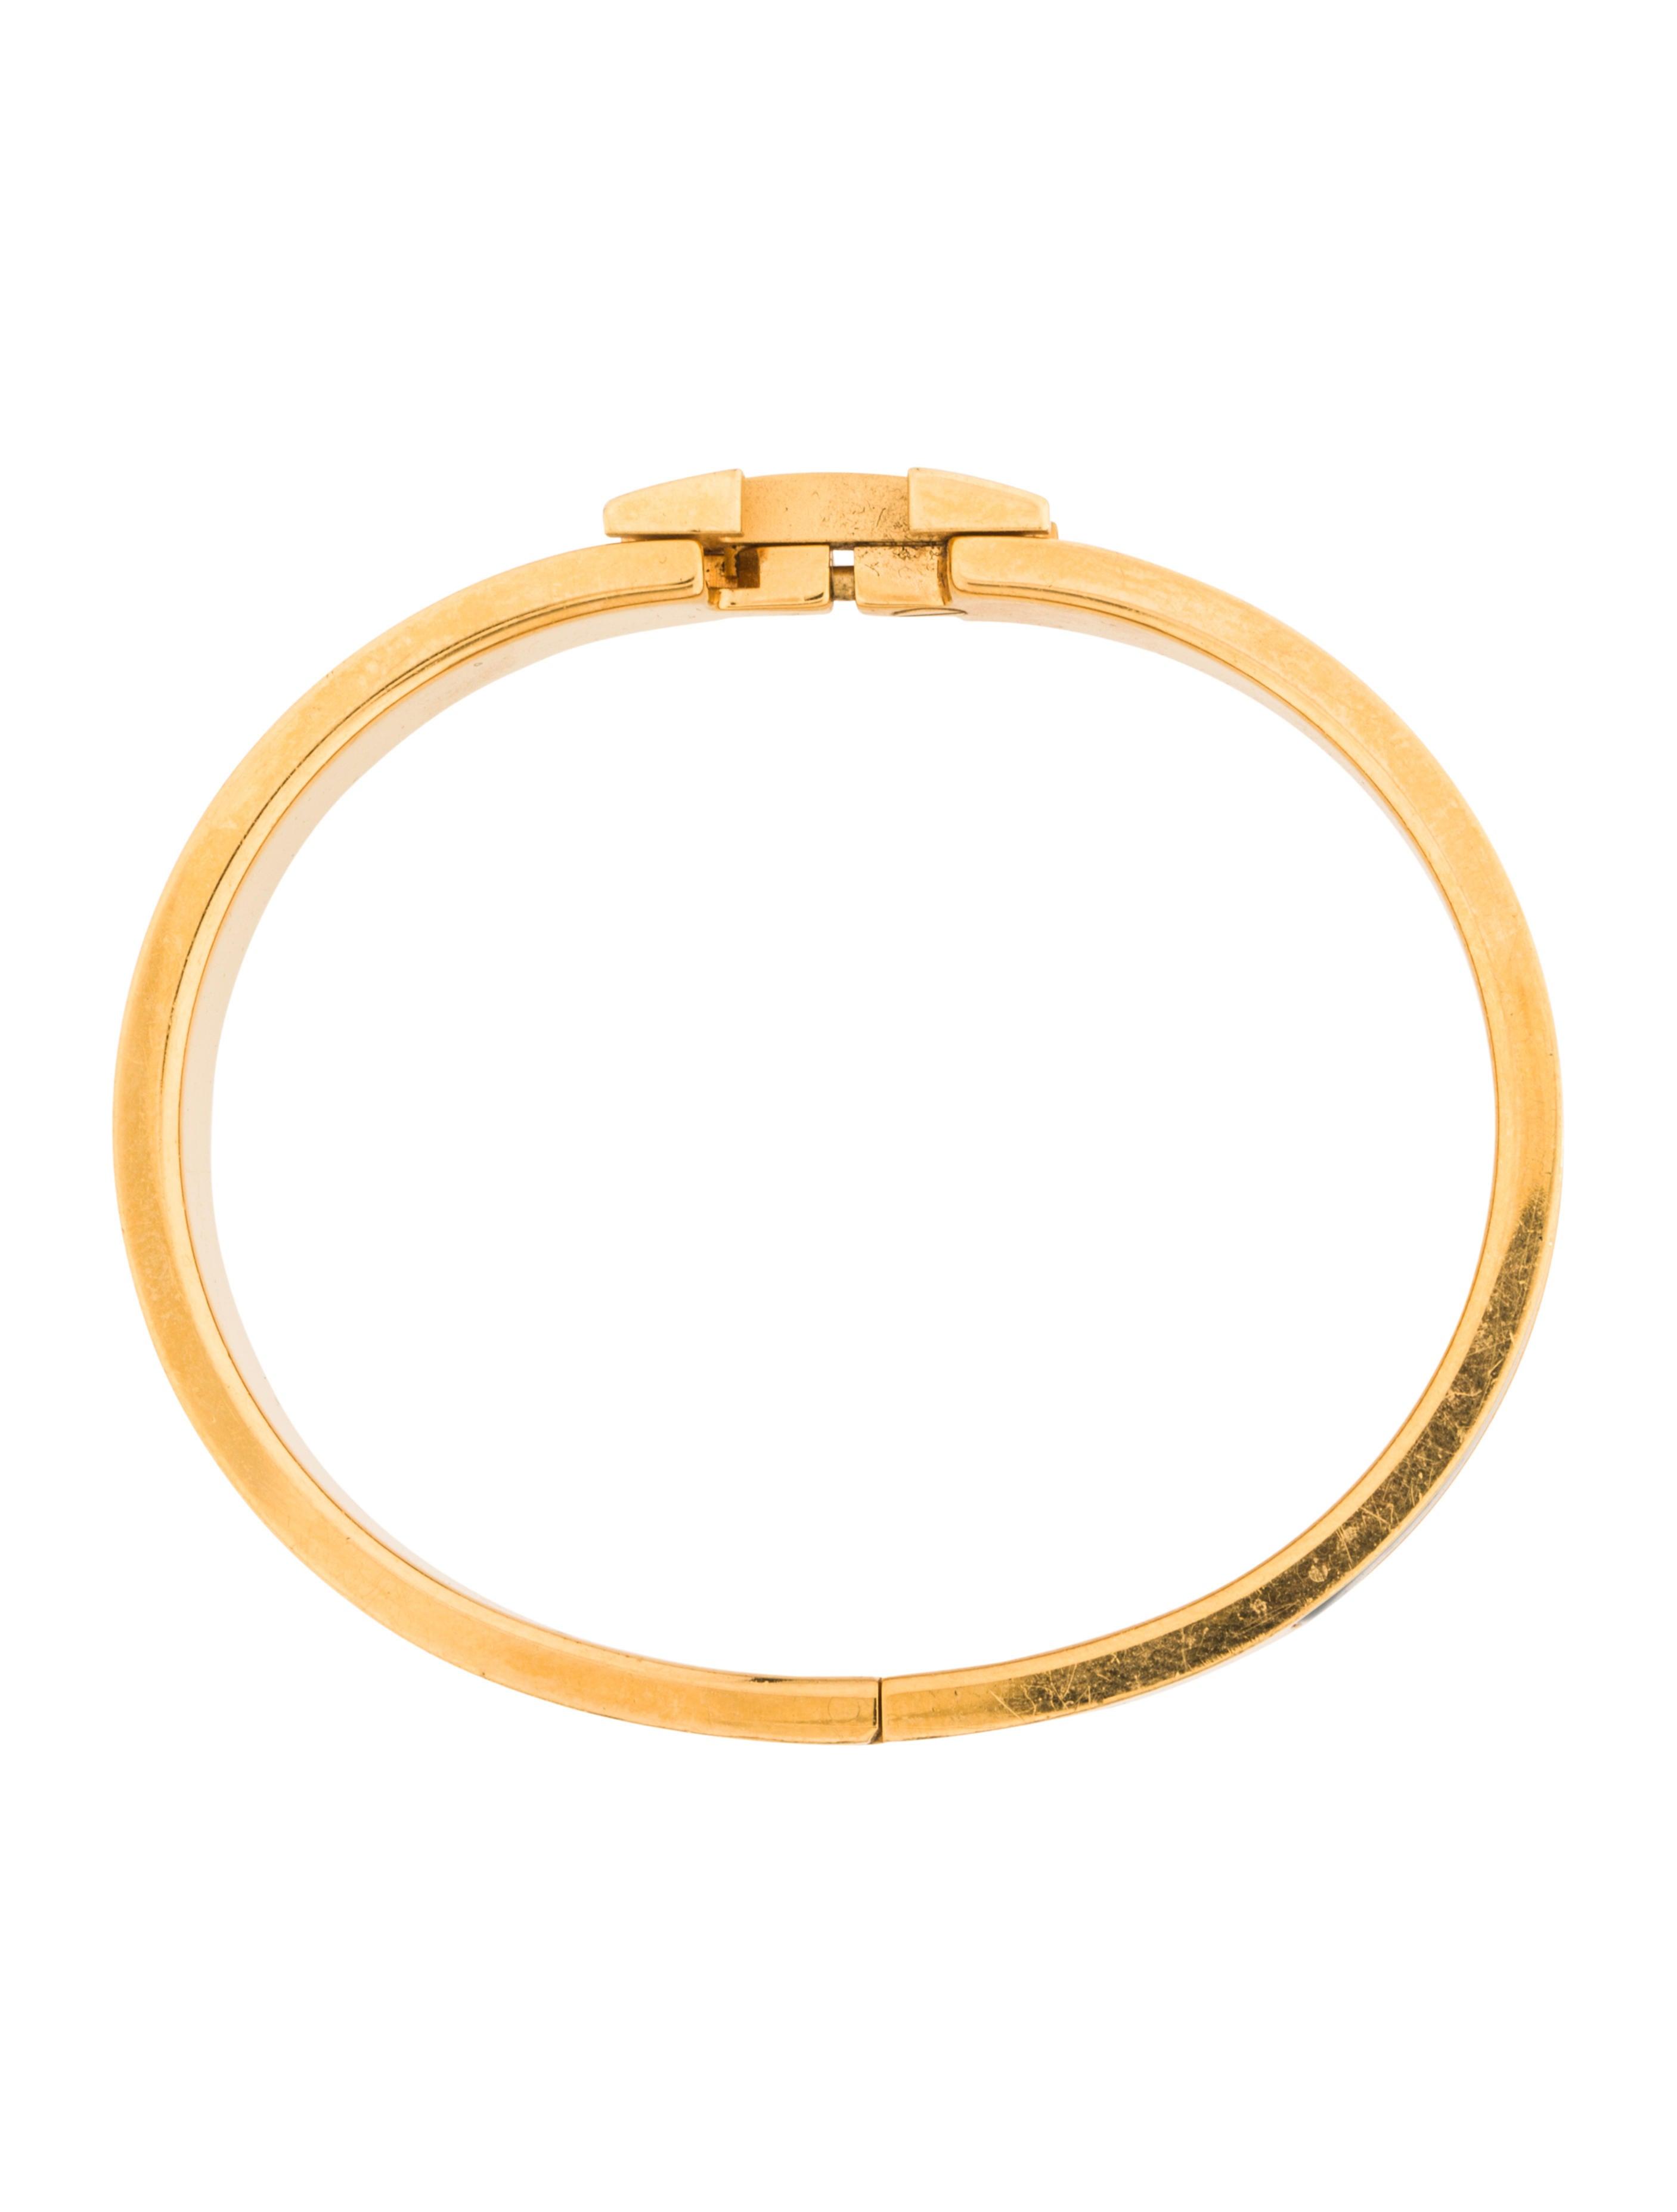 herm s narrow pm clic clac h bracelet bracelets. Black Bedroom Furniture Sets. Home Design Ideas